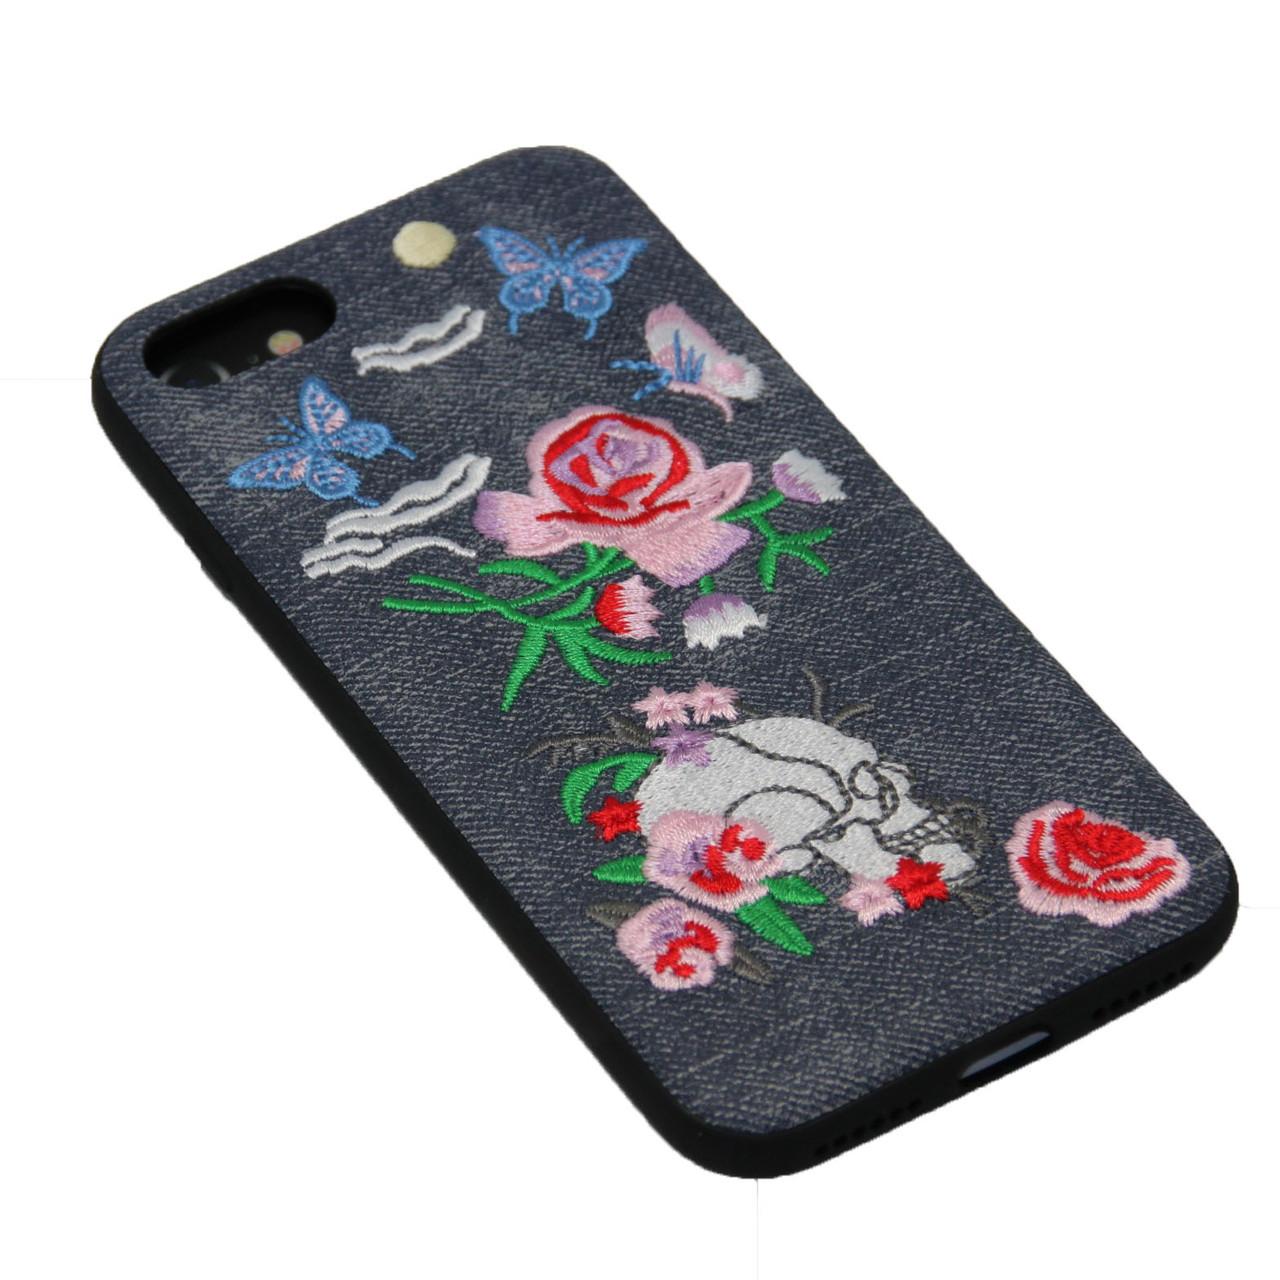 Чехол WK Embroidery iPhone 7 - фото 4